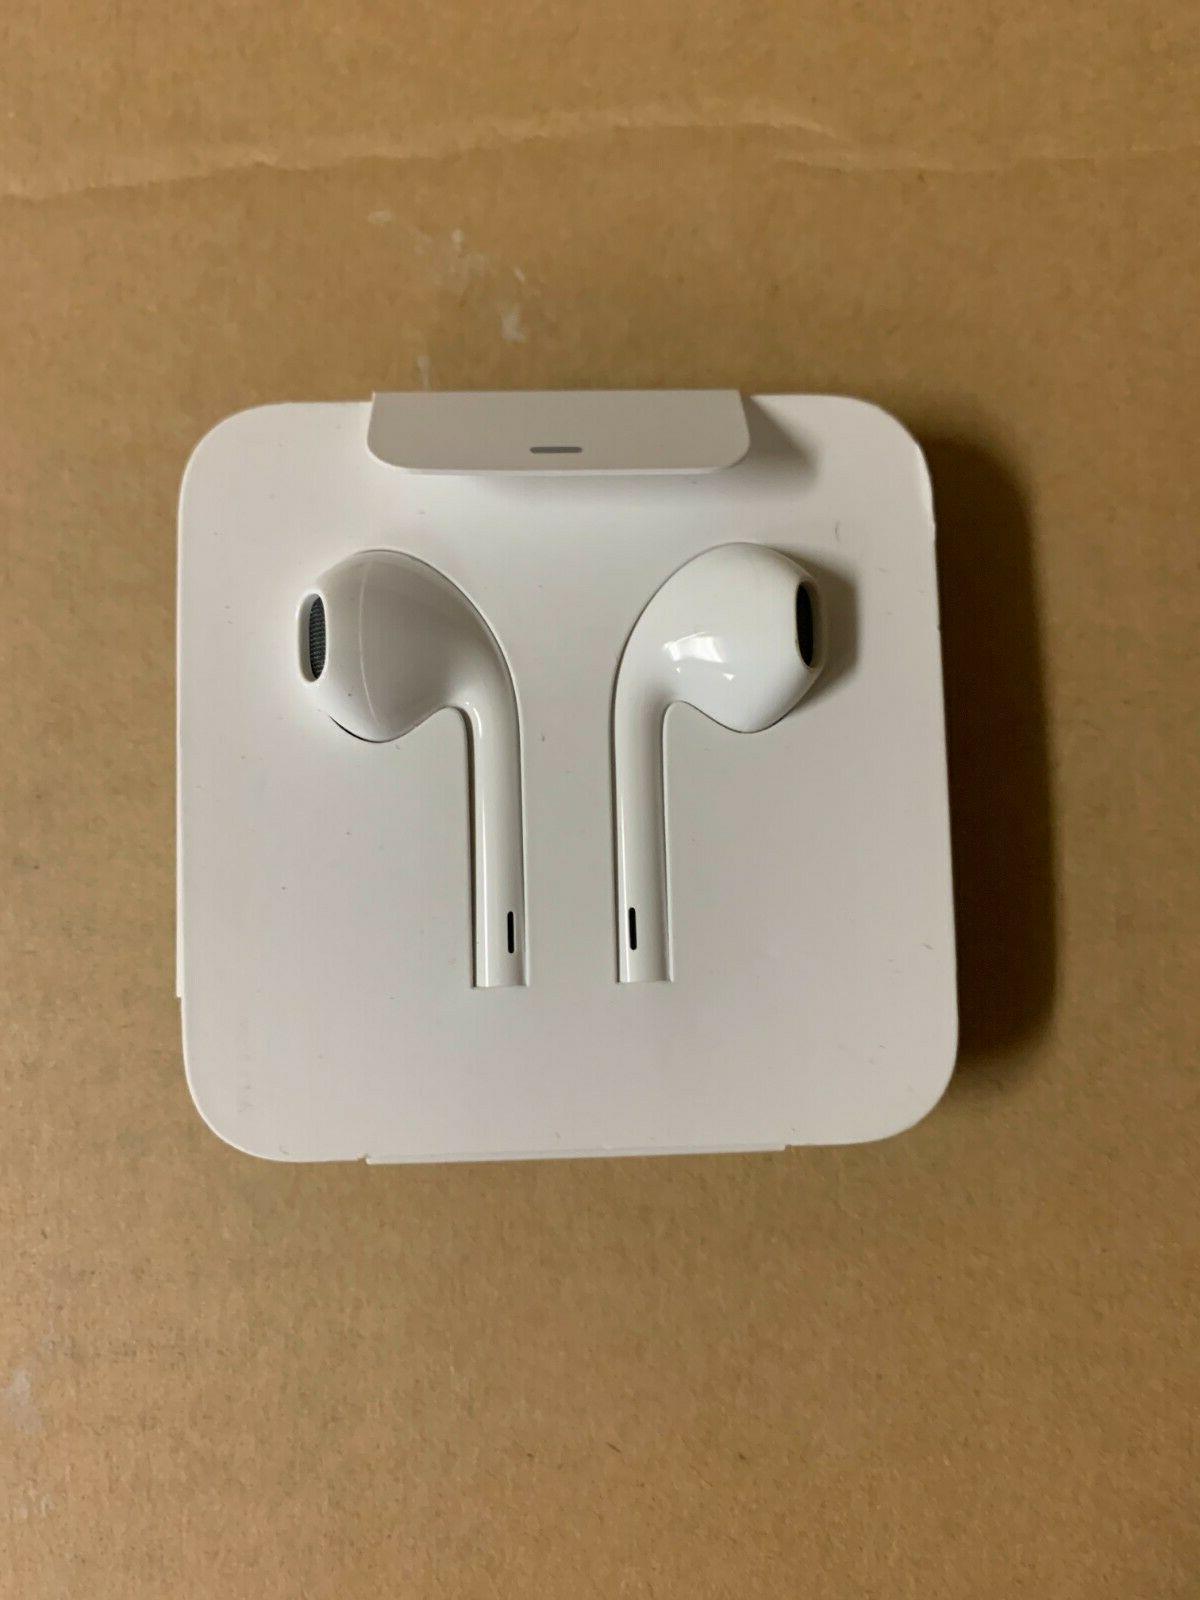 Apple iPhone 7 Plus 12 EarPods Lightning